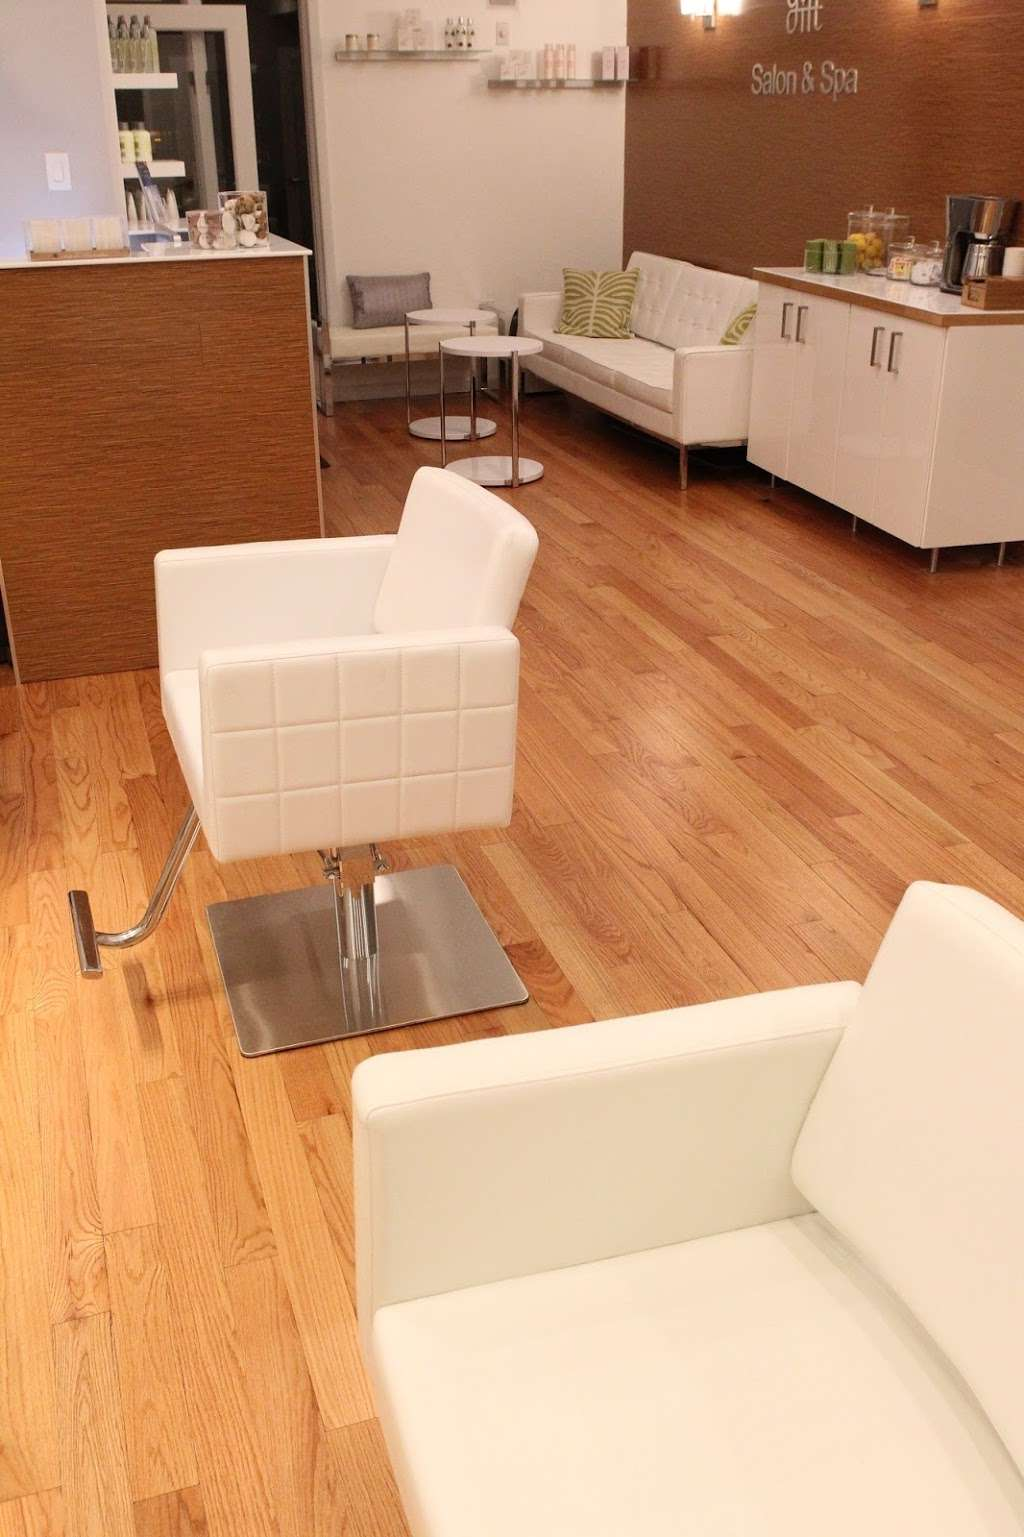 Gift Salon & Spa - hair care  | Photo 3 of 10 | Address: 64 Notch Rd, Woodland Park, NJ 07424, USA | Phone: (973) 807-2219